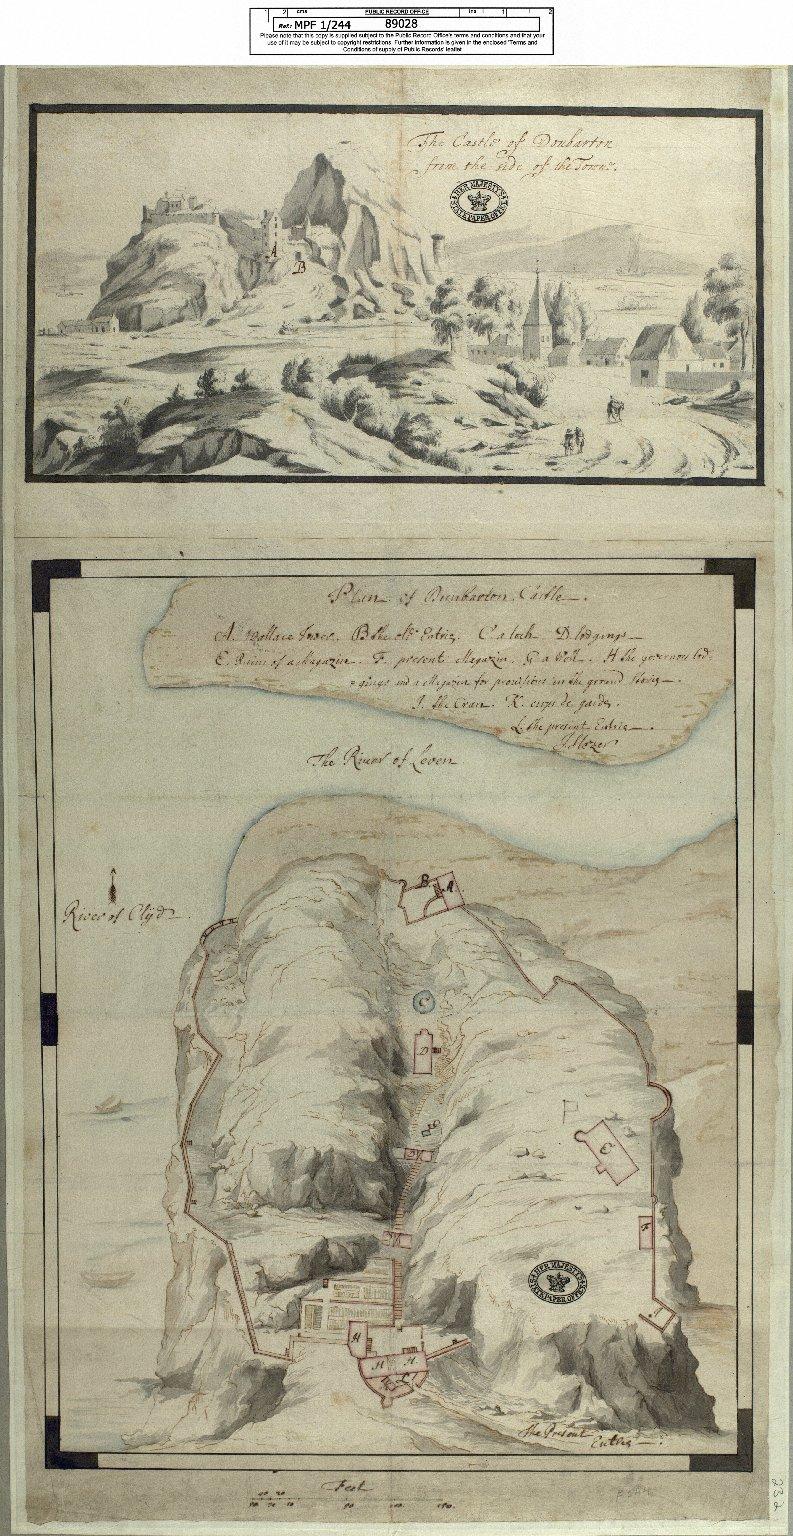 Plan of Dunbarton Castle [1 of 1]